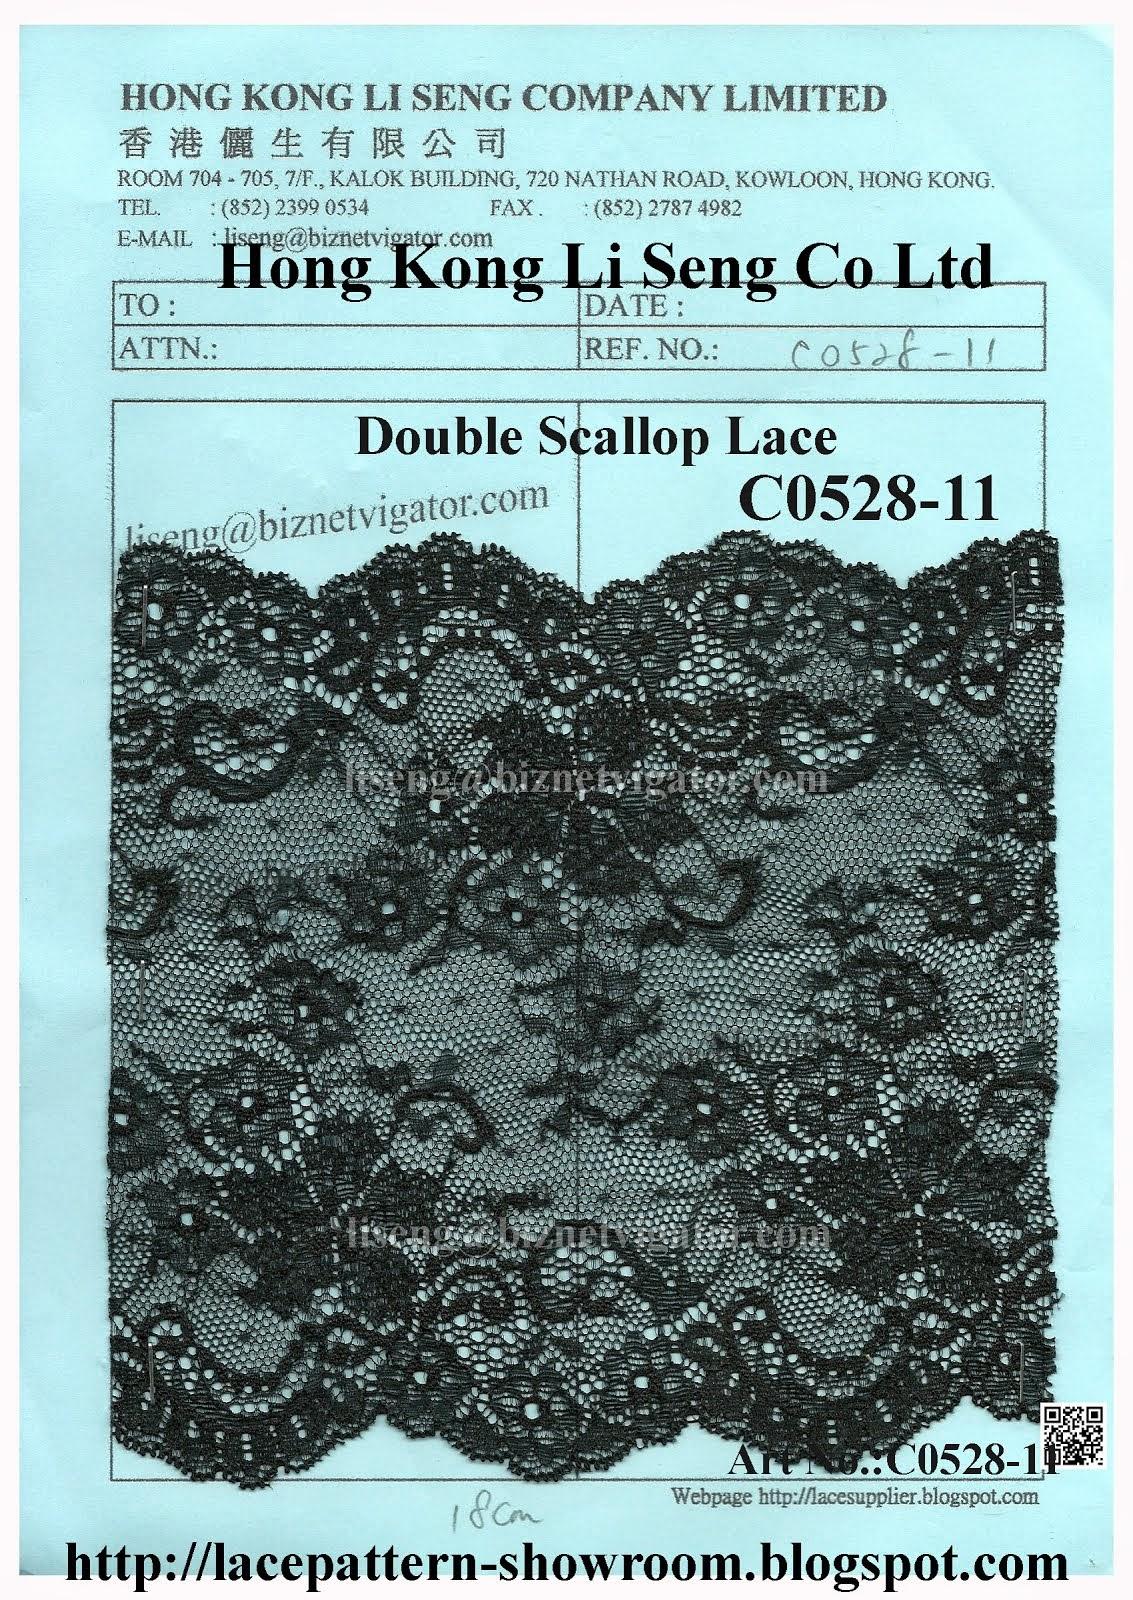 Double Scallop Non-Elastic Lace Trimming Manufacturer - Hong Kong Li Seng Co Ltd